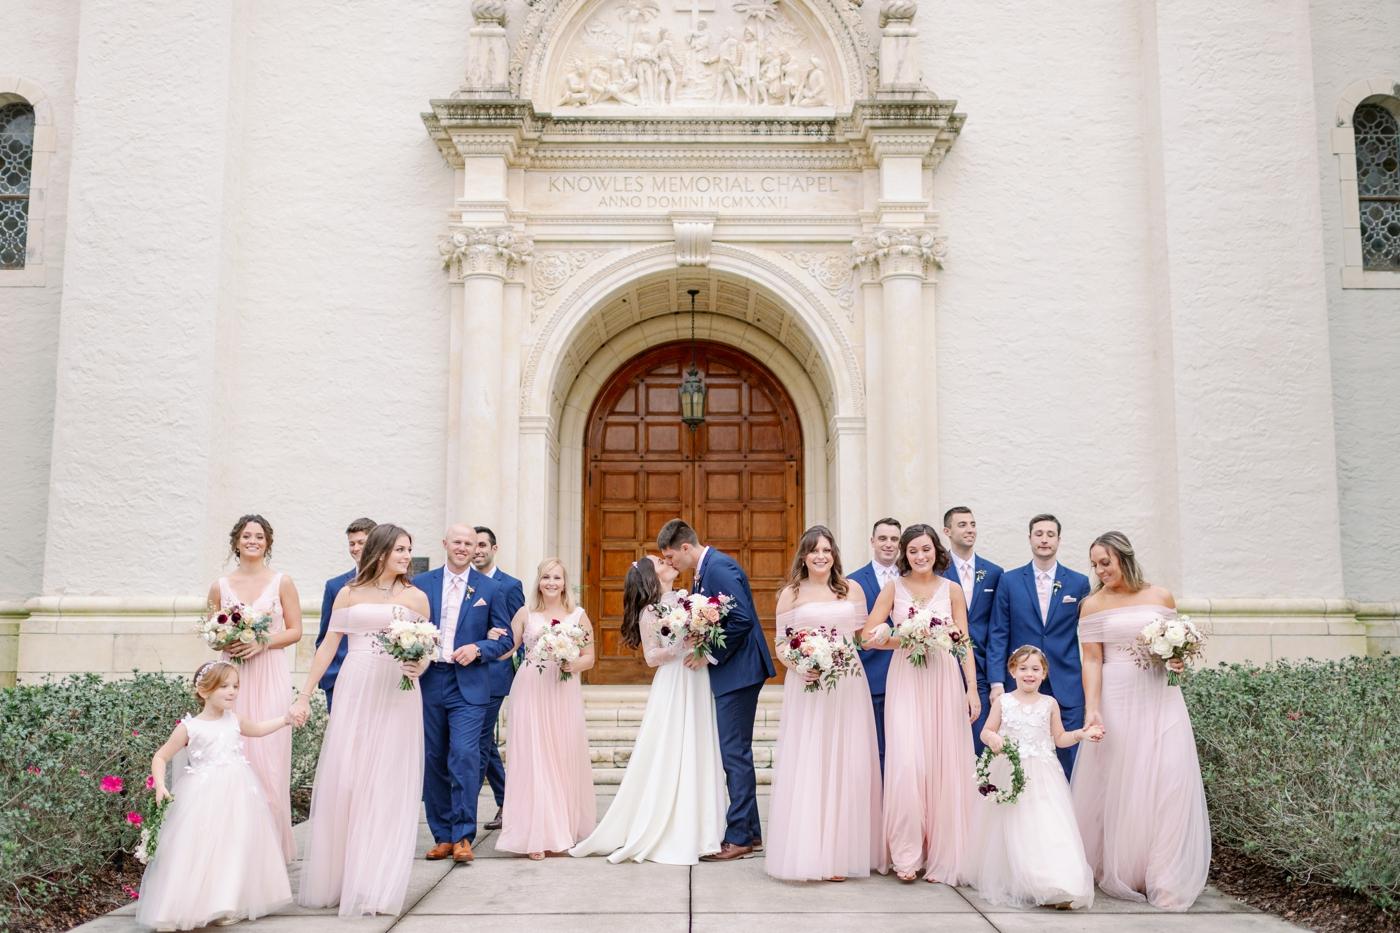 cute wedding party photo ideas